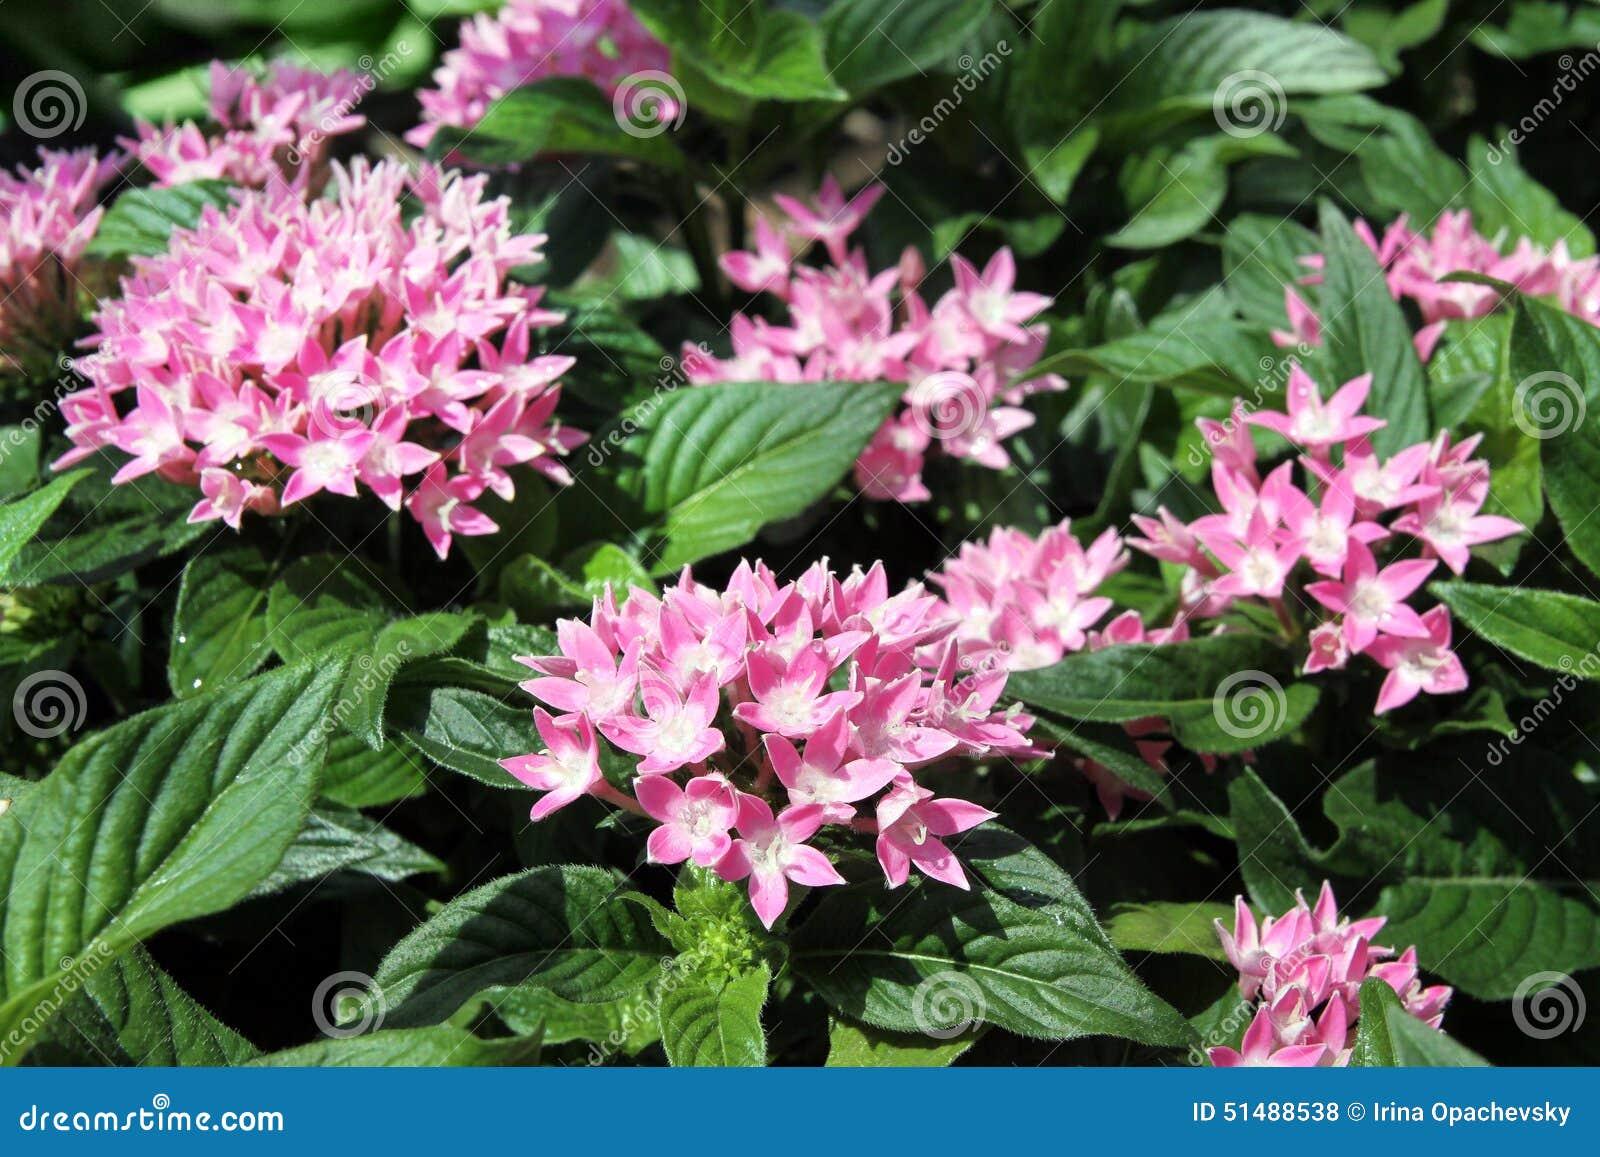 Pentas evergreen shrub stock photo image of plant pink 51488538 download pentas evergreen shrub stock photo image of plant pink 51488538 mightylinksfo